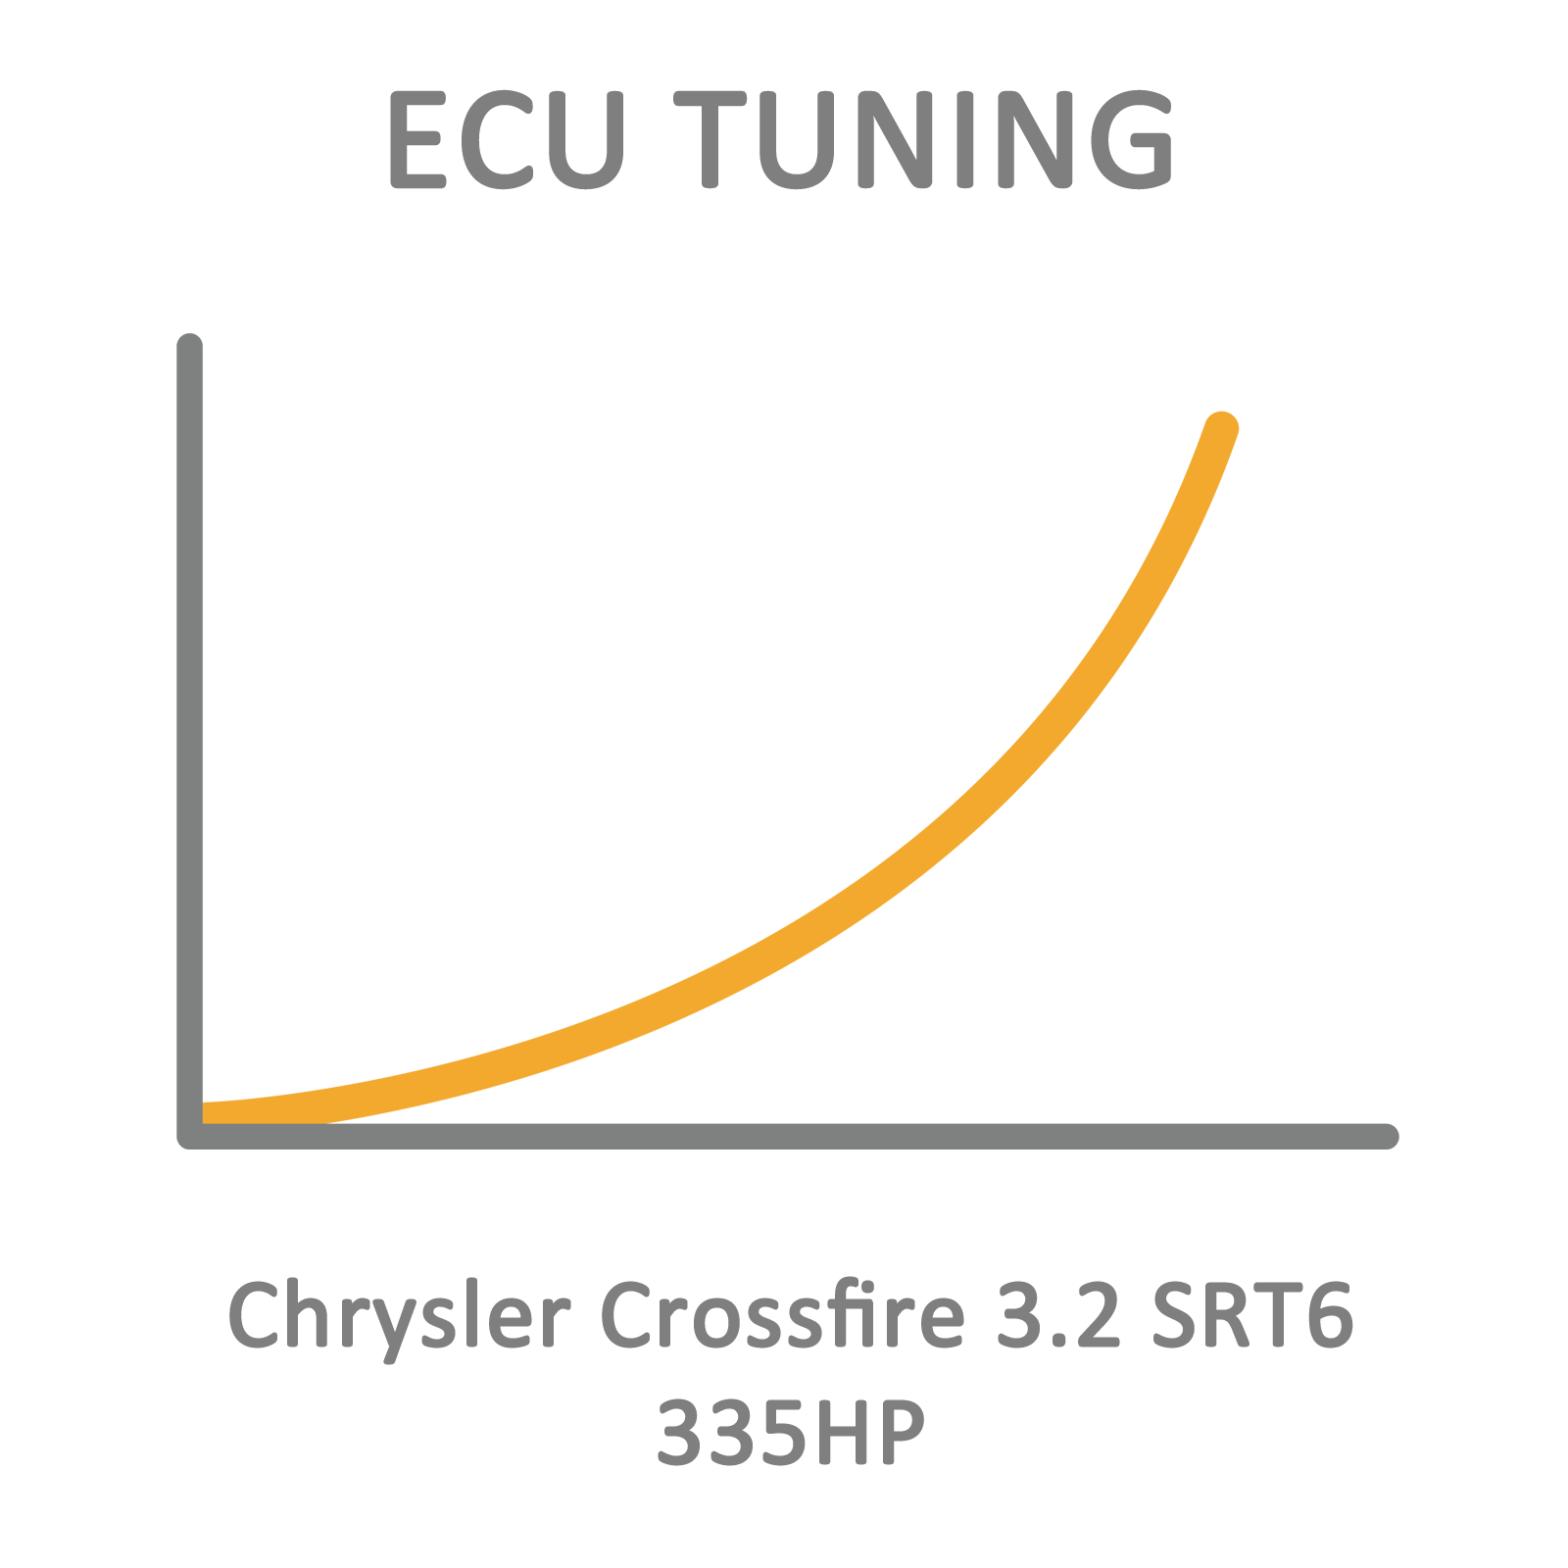 Chrysler Crossfire 3.2 SRT6 335HP ECU Tuning Remapping